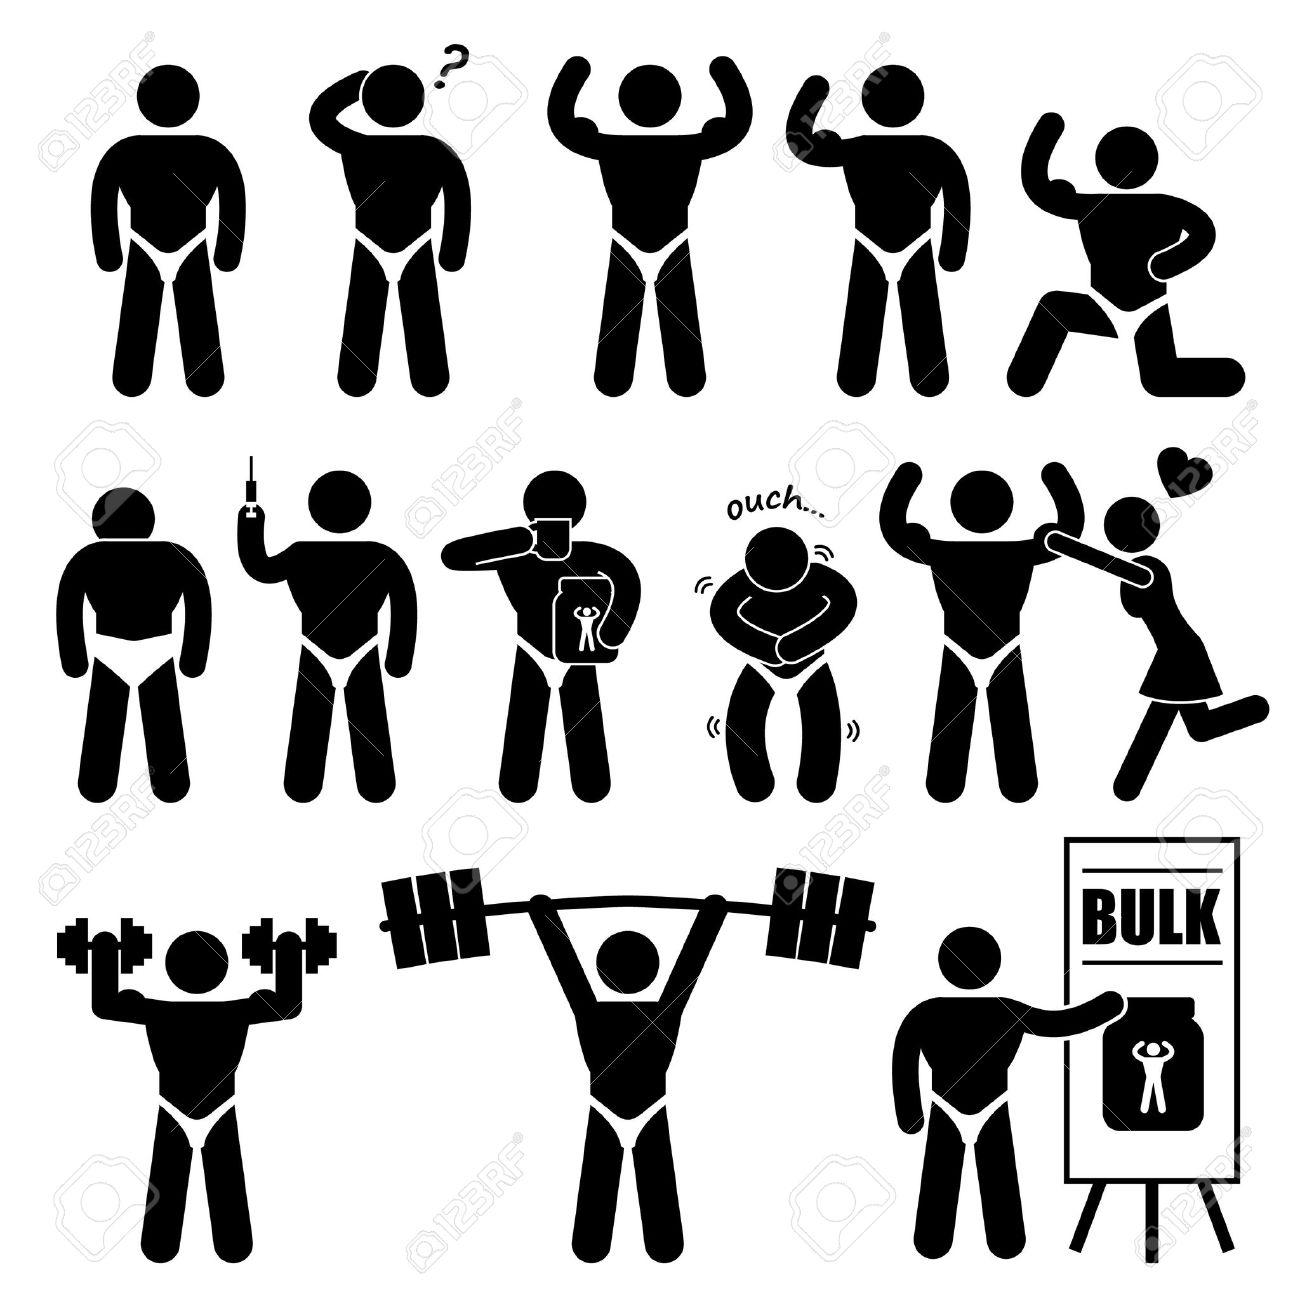 Musculalr Man Workout Clipart